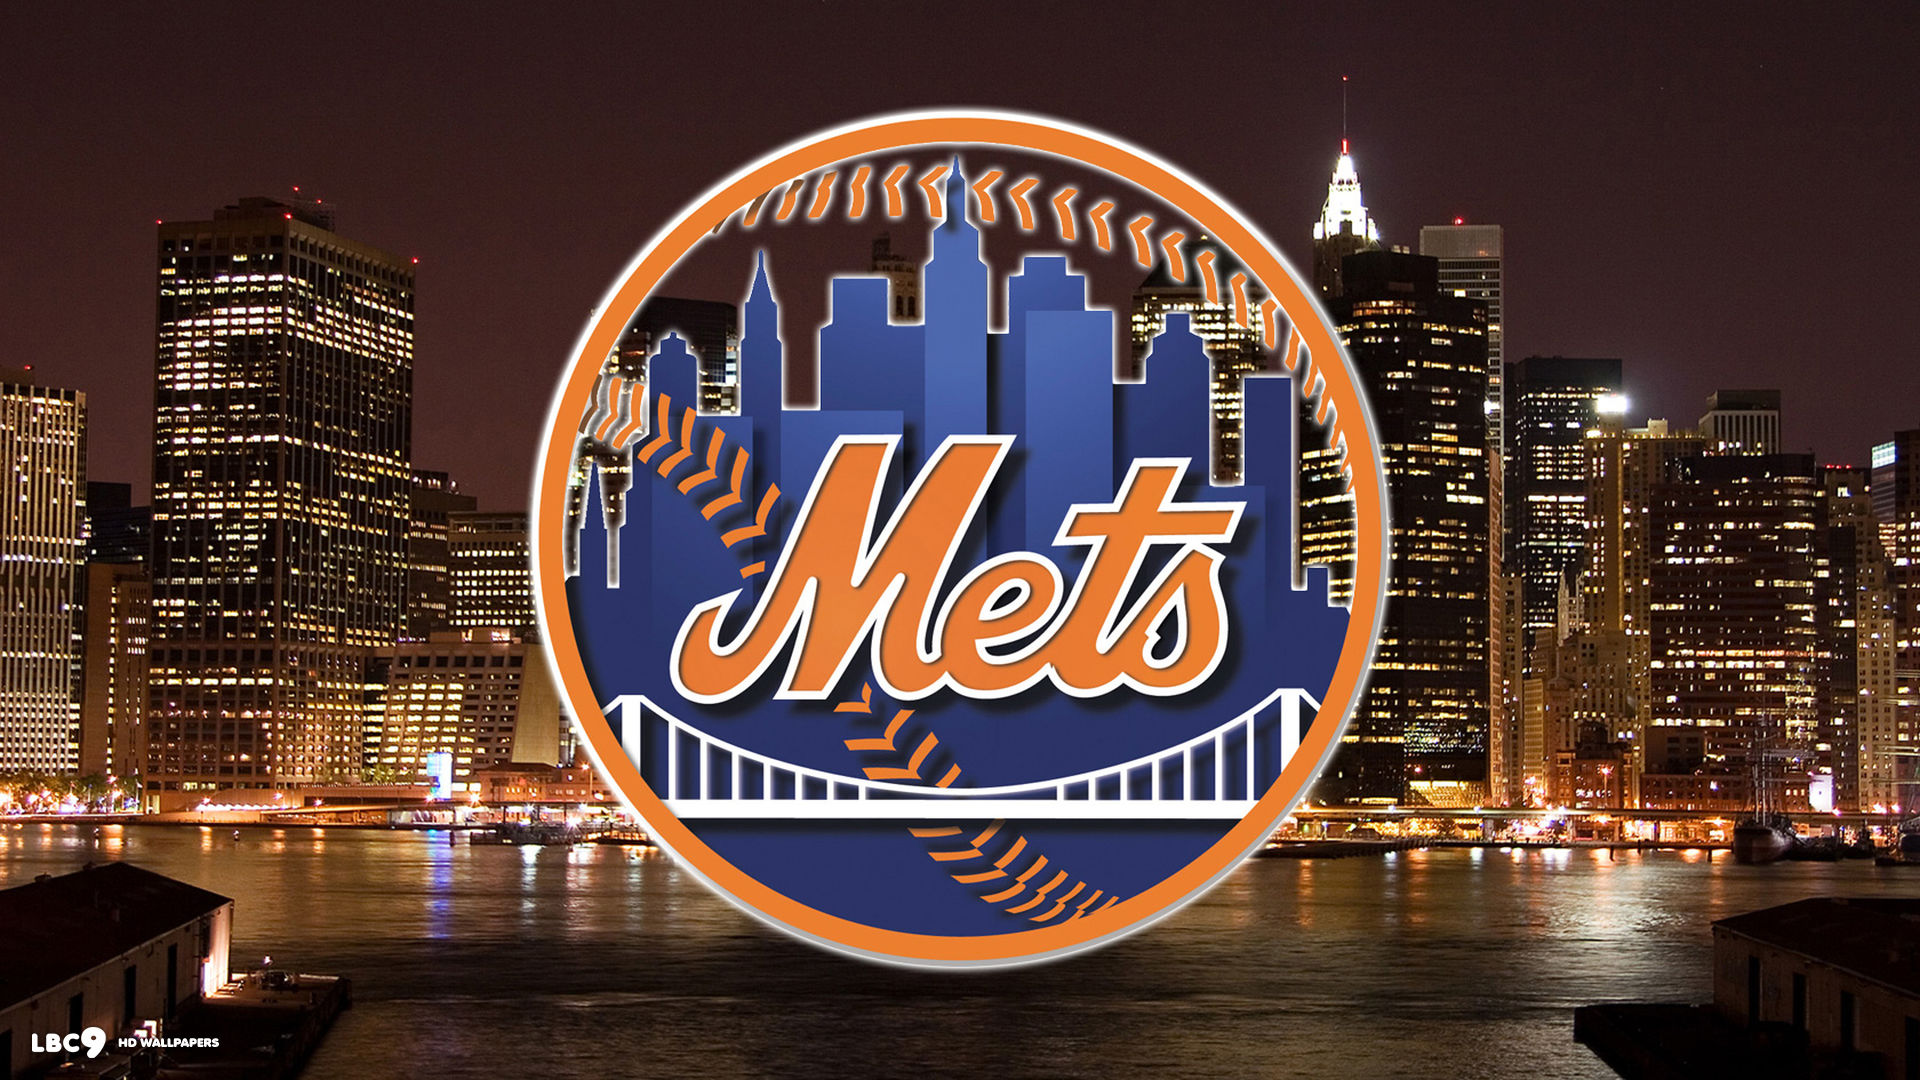 New York Mets Wallpaper: NEW YORK METS Baseball Mlb (31) Wallpaper